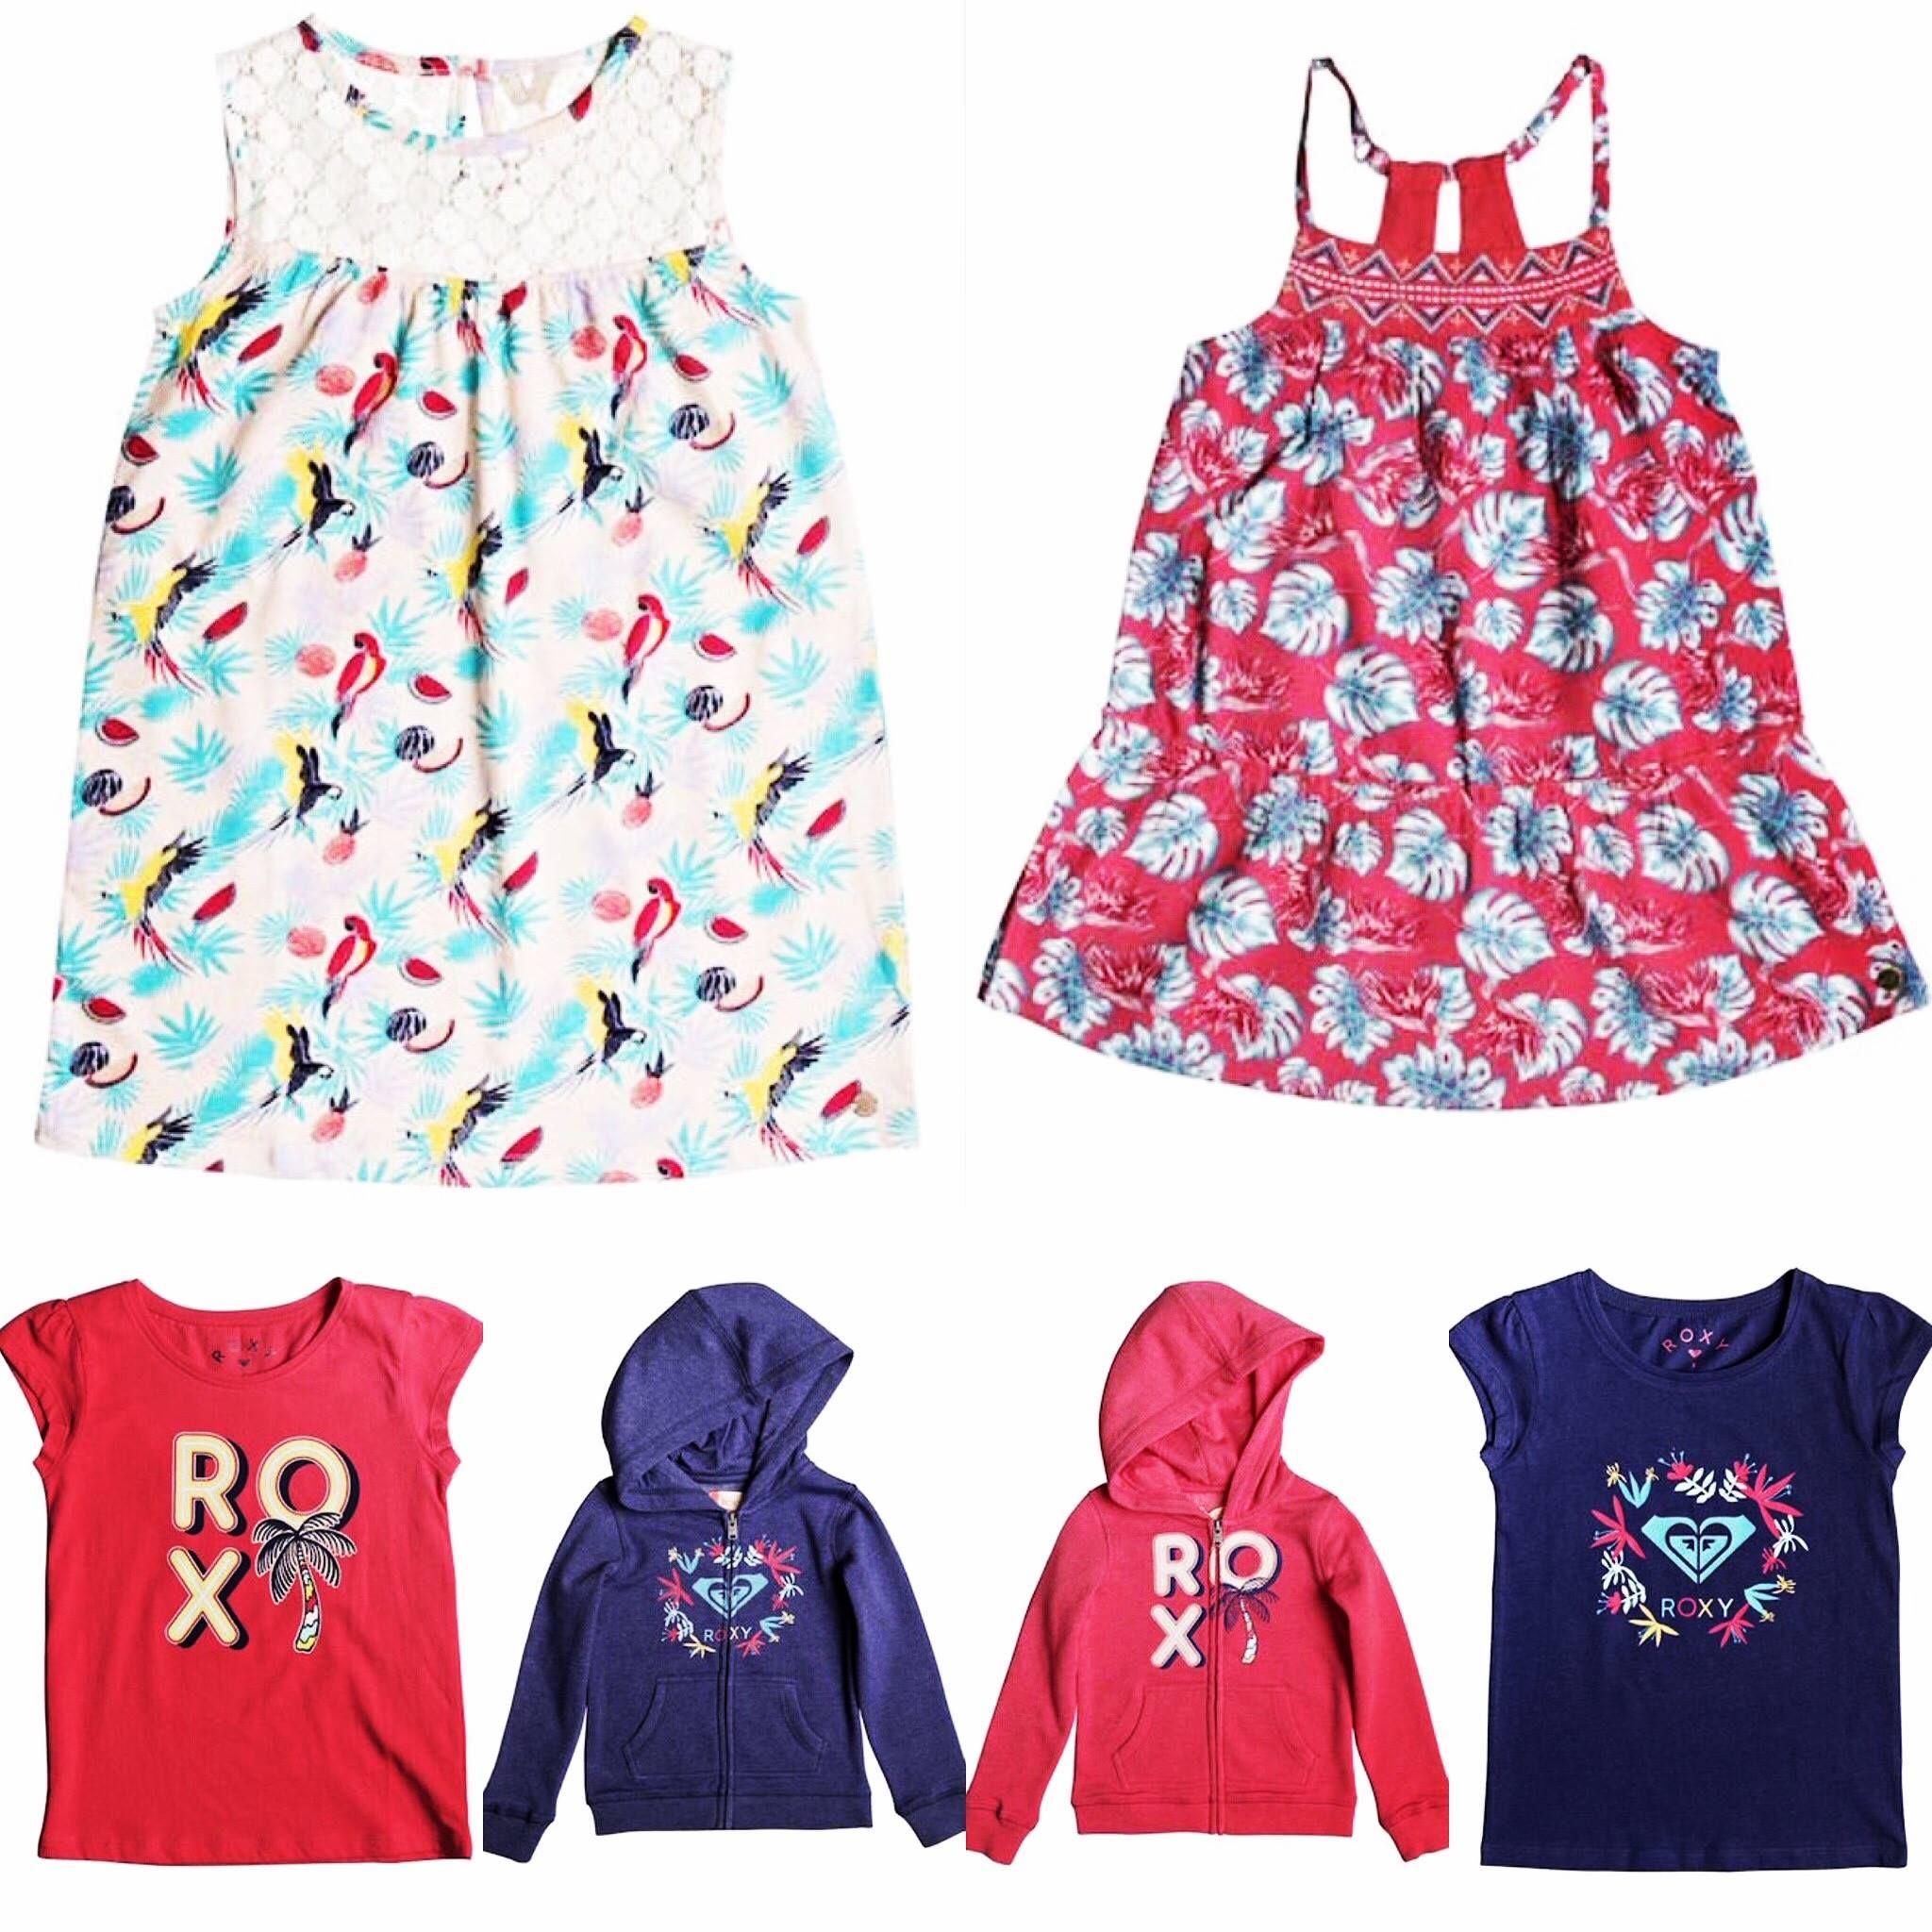 Roxy Girl size 2 7 Spring 18 Collection roxy roxysurf roxygirl